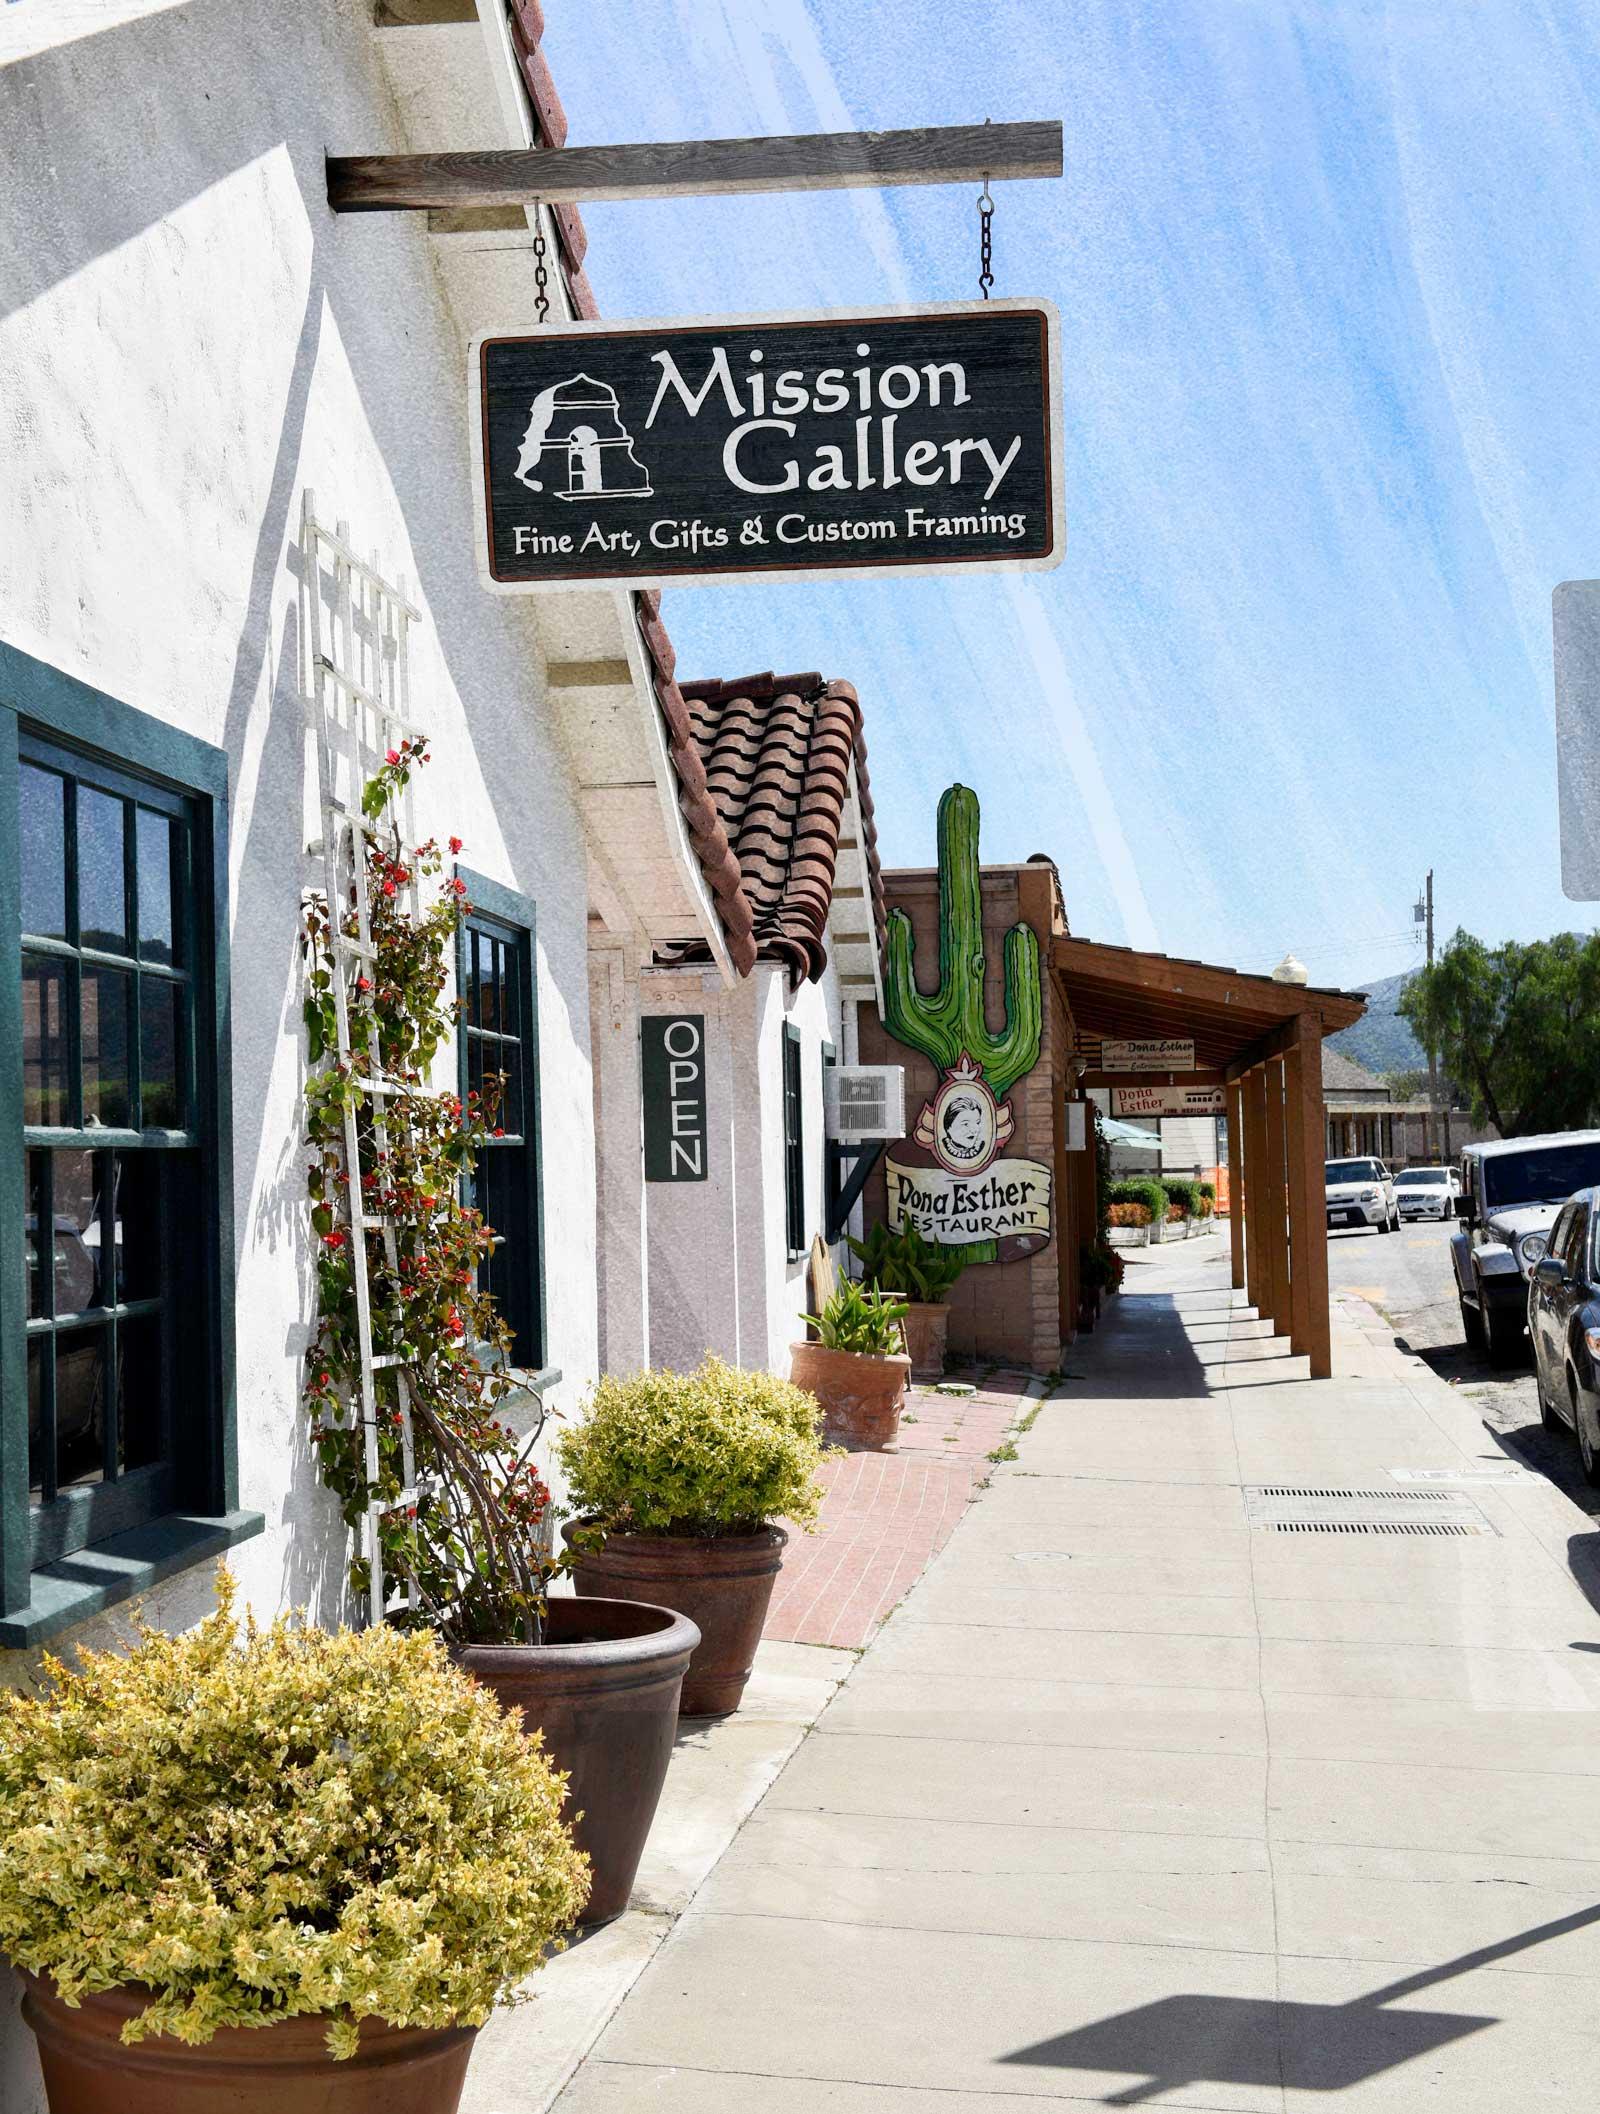 San Juan Bautista Mission Gallery